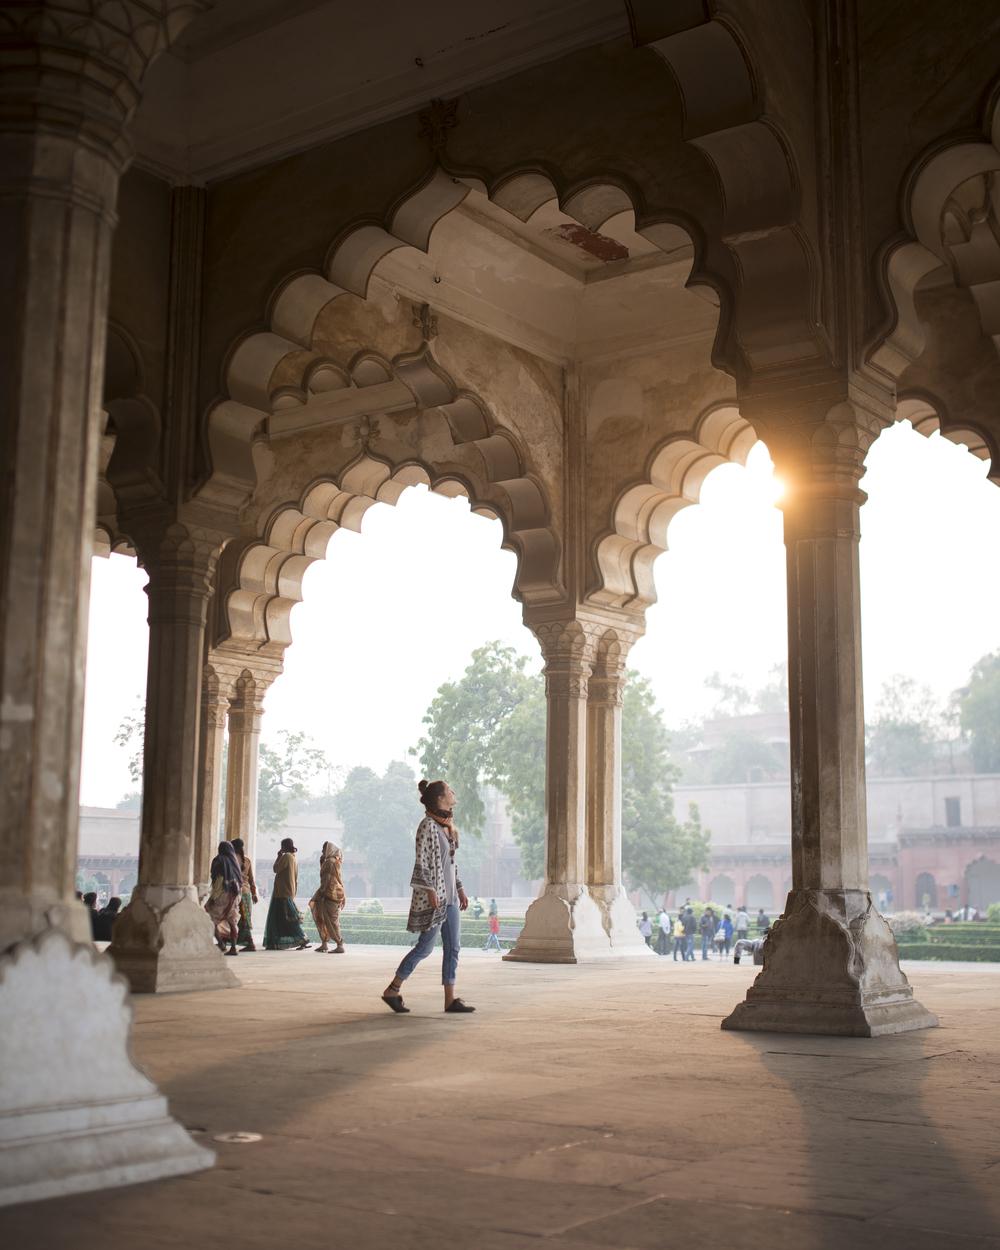 20151216 - Agra (Randi Columns).jpg